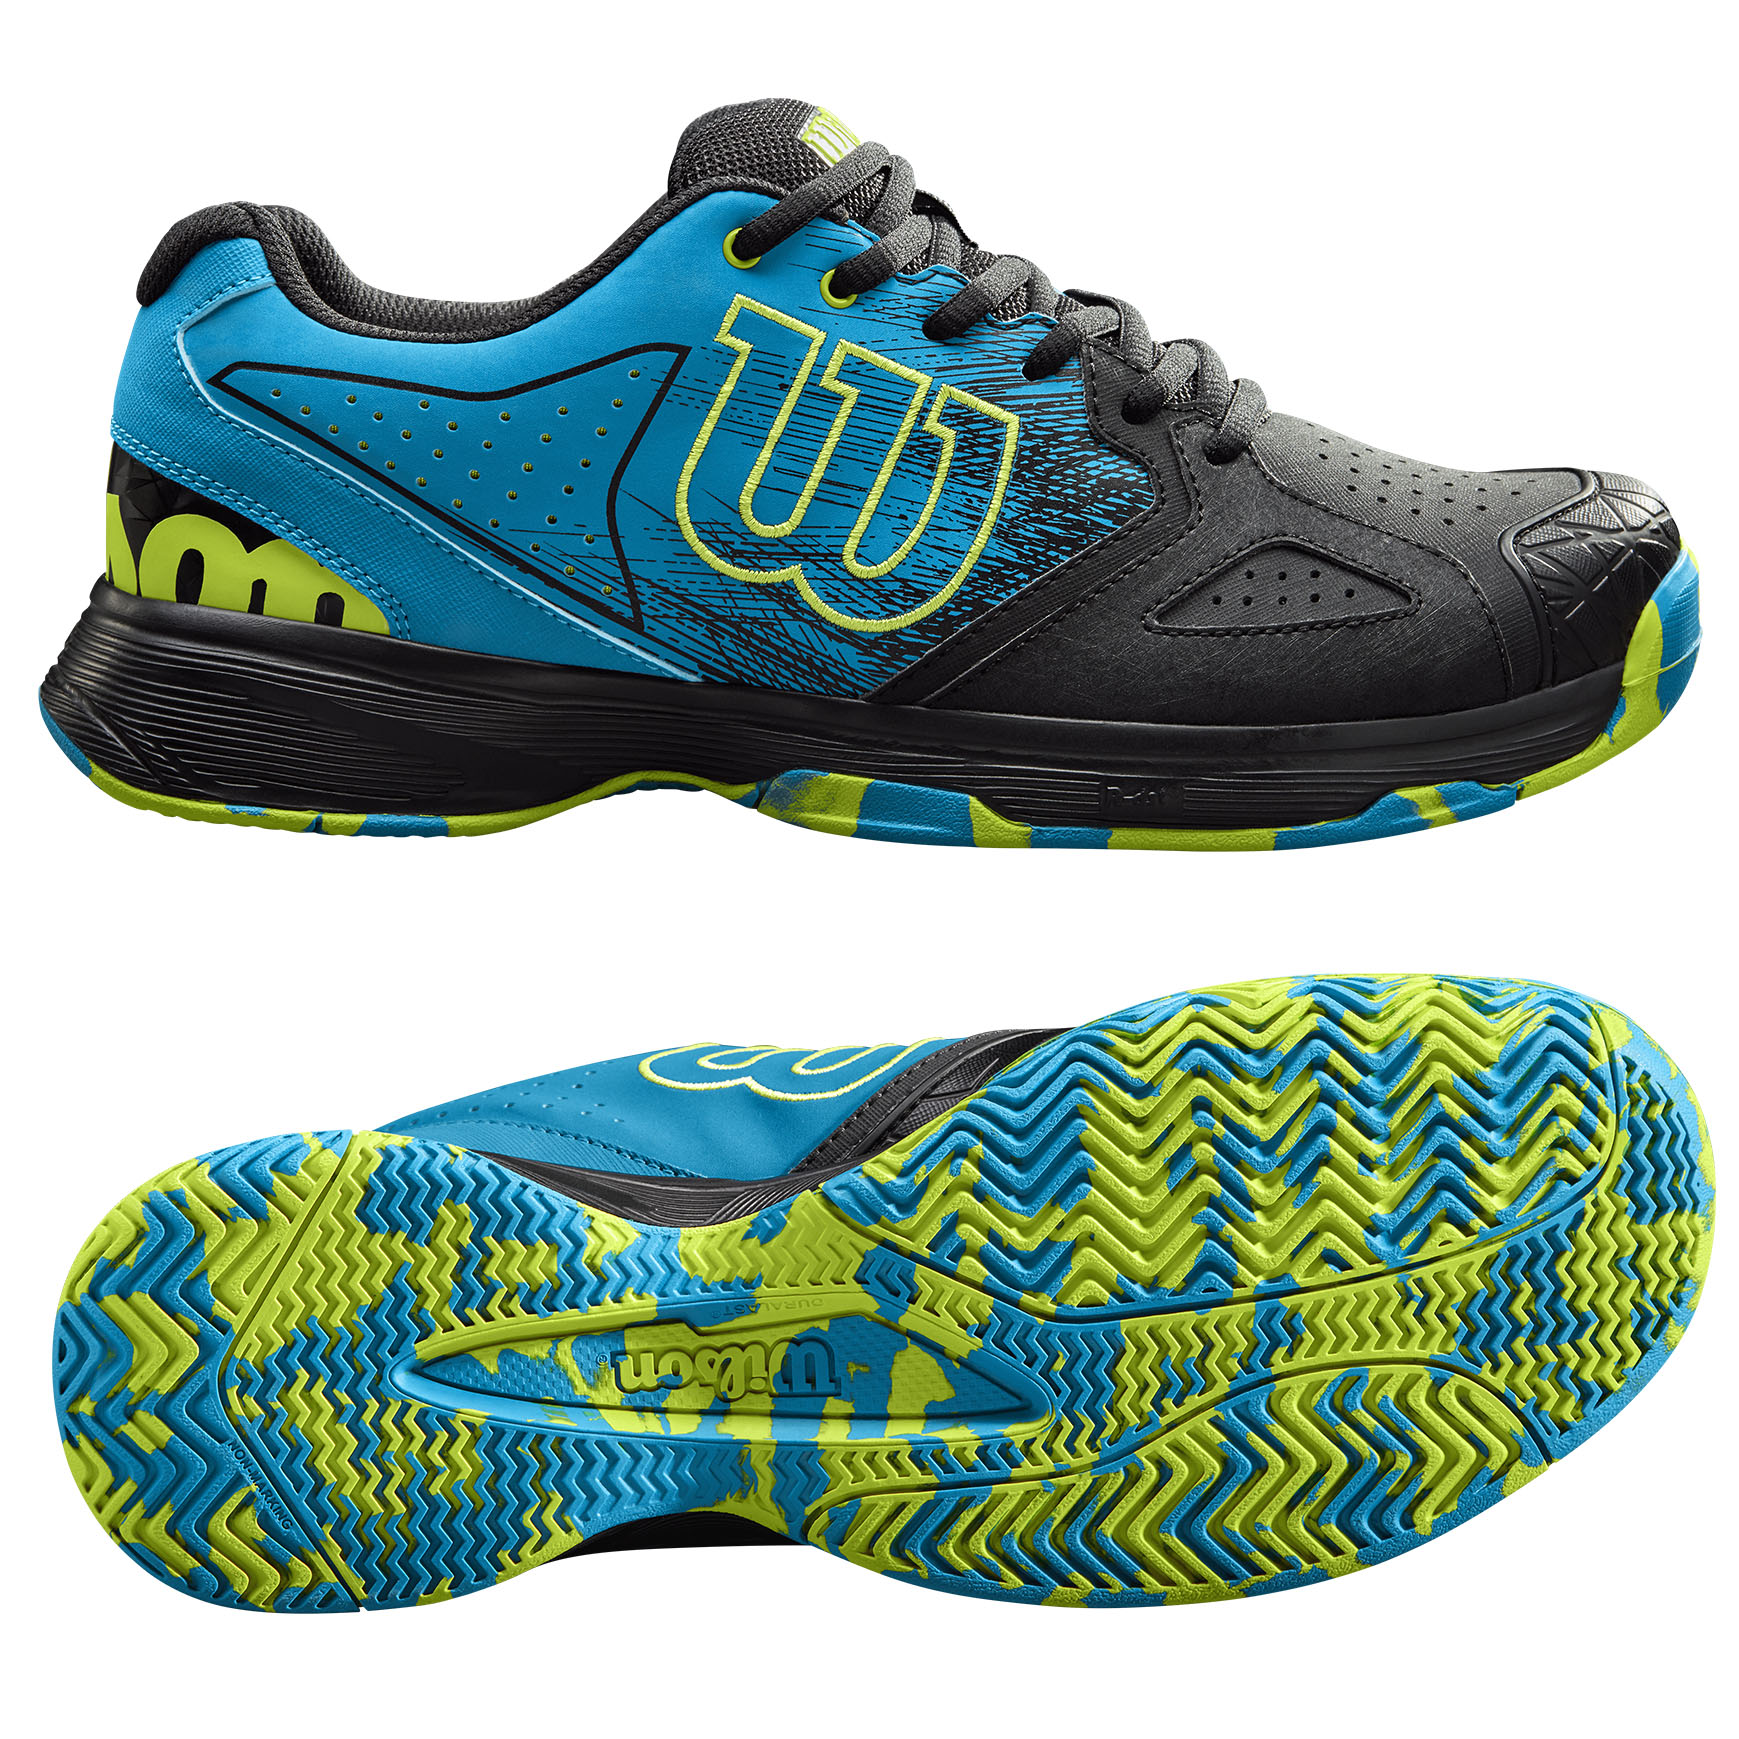 wilson kaos devo mens tennis shoes 7 5 uk all these deals